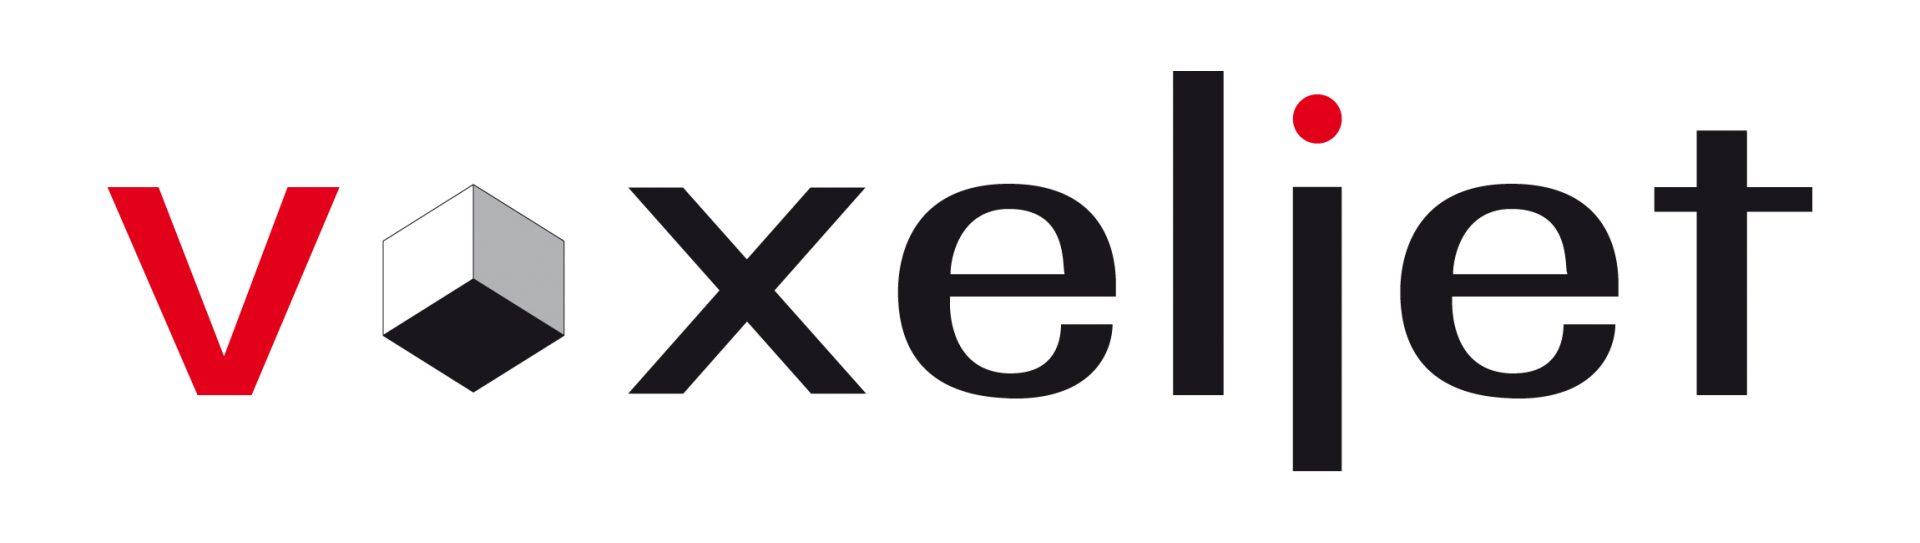 voxljet logo